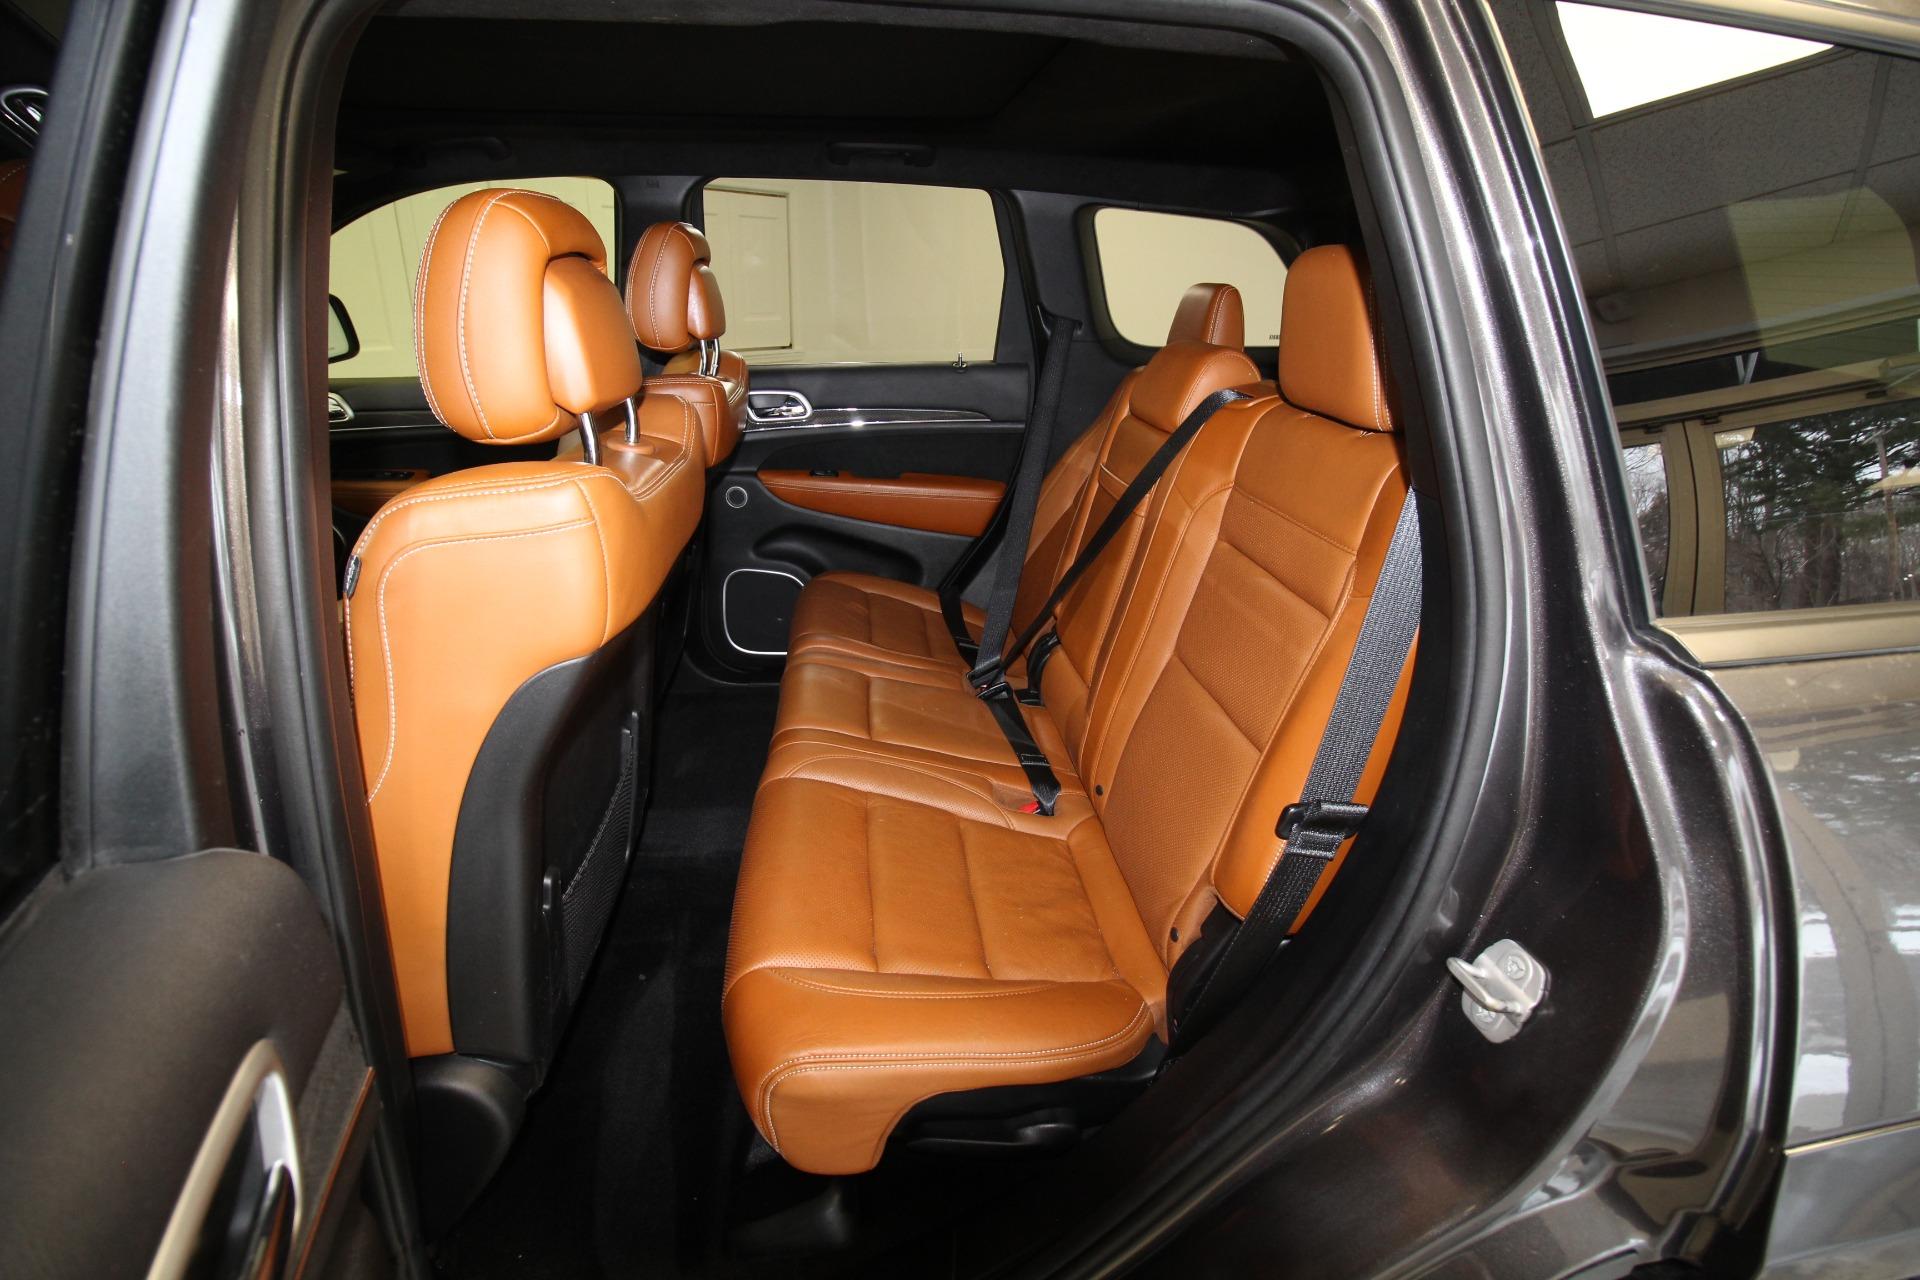 Used 2014 Jeep Grand Cherokee SRT8 4WD LOCAL NEW CAR TRADE VERY CLEAN | Albany, NY